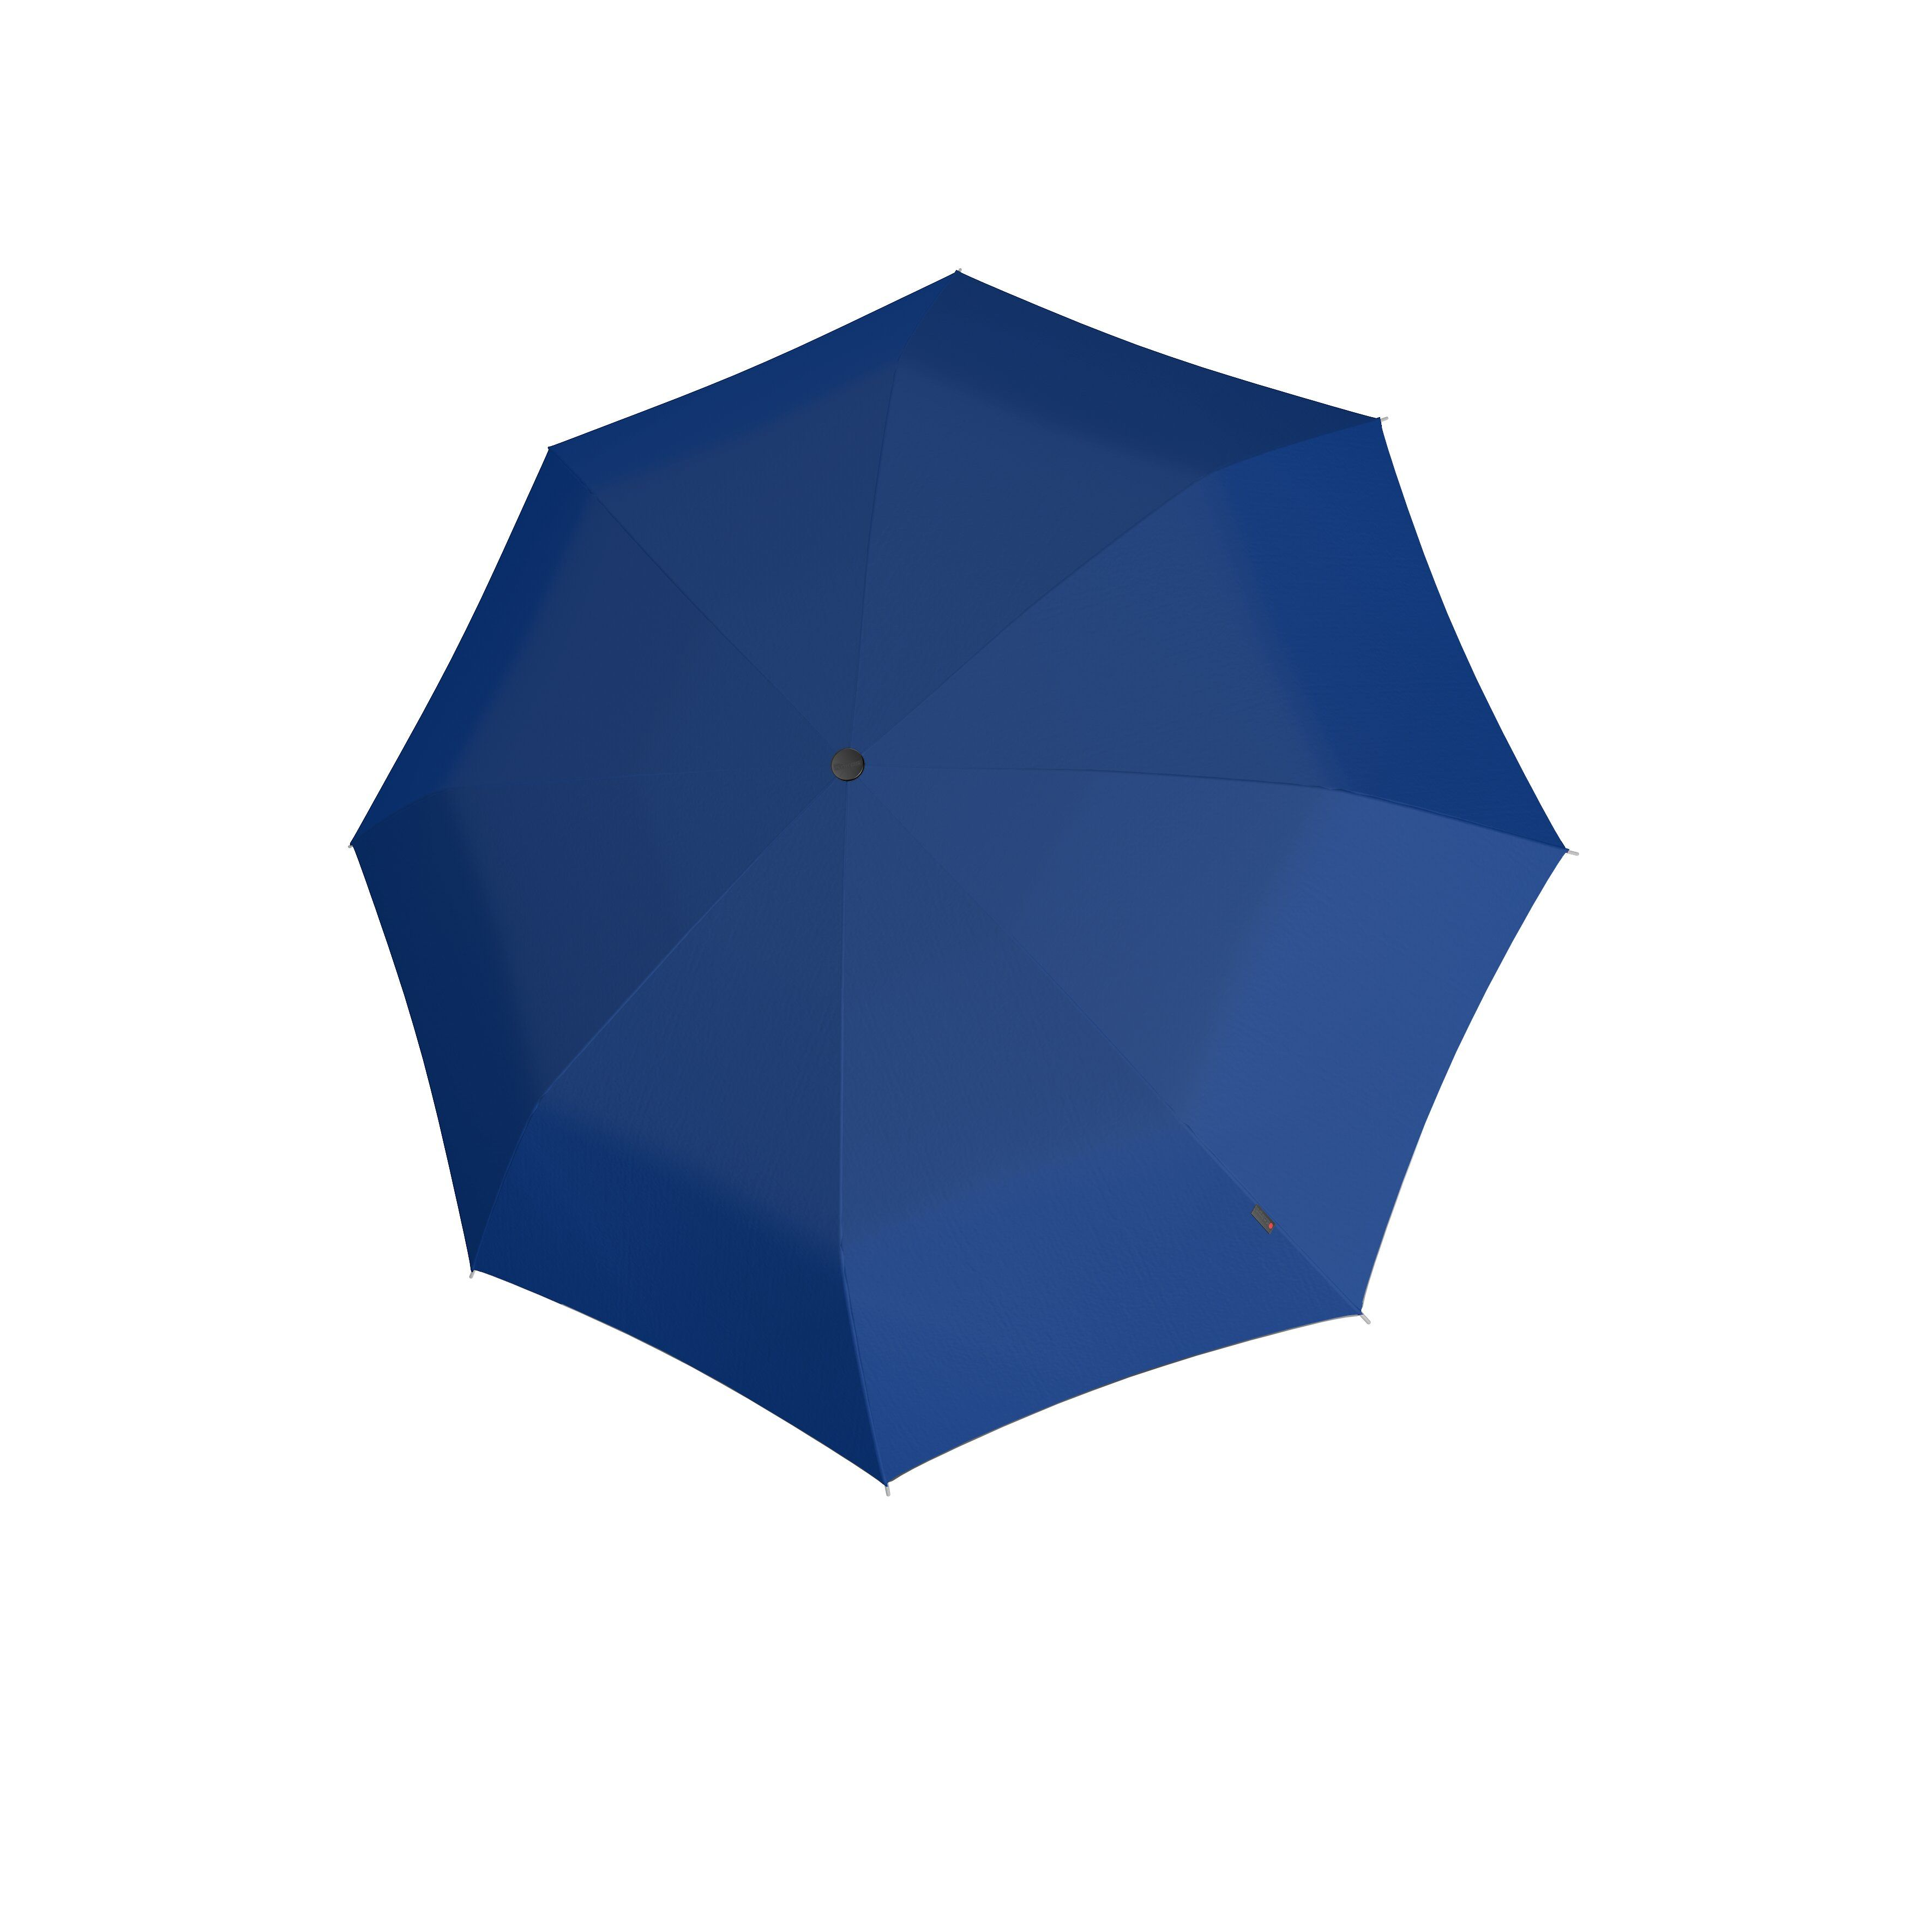 Knirps Umbrella A.200 medium duomatic - foto 2